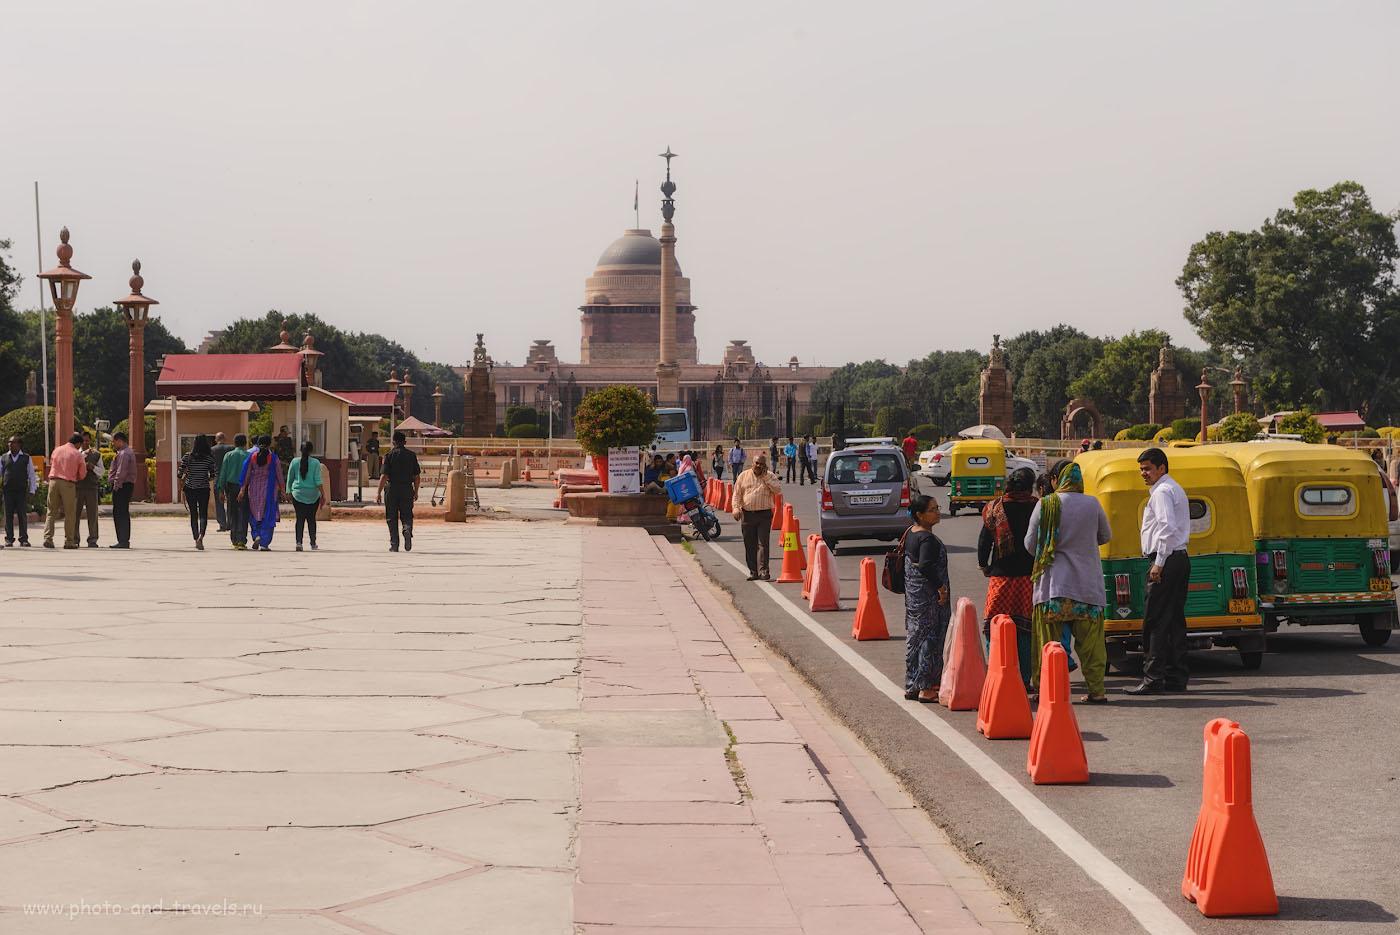 Фотография 22. Вот такая Индия встречает вас на станции метро «Central Secretary». Президентский дворец Раштрапати-Бхаван (Rashtrapati Bhavan). Nikon 70-200 + экстендер Nikon TC-14E II. 1/320, 9.0, 100, 70.